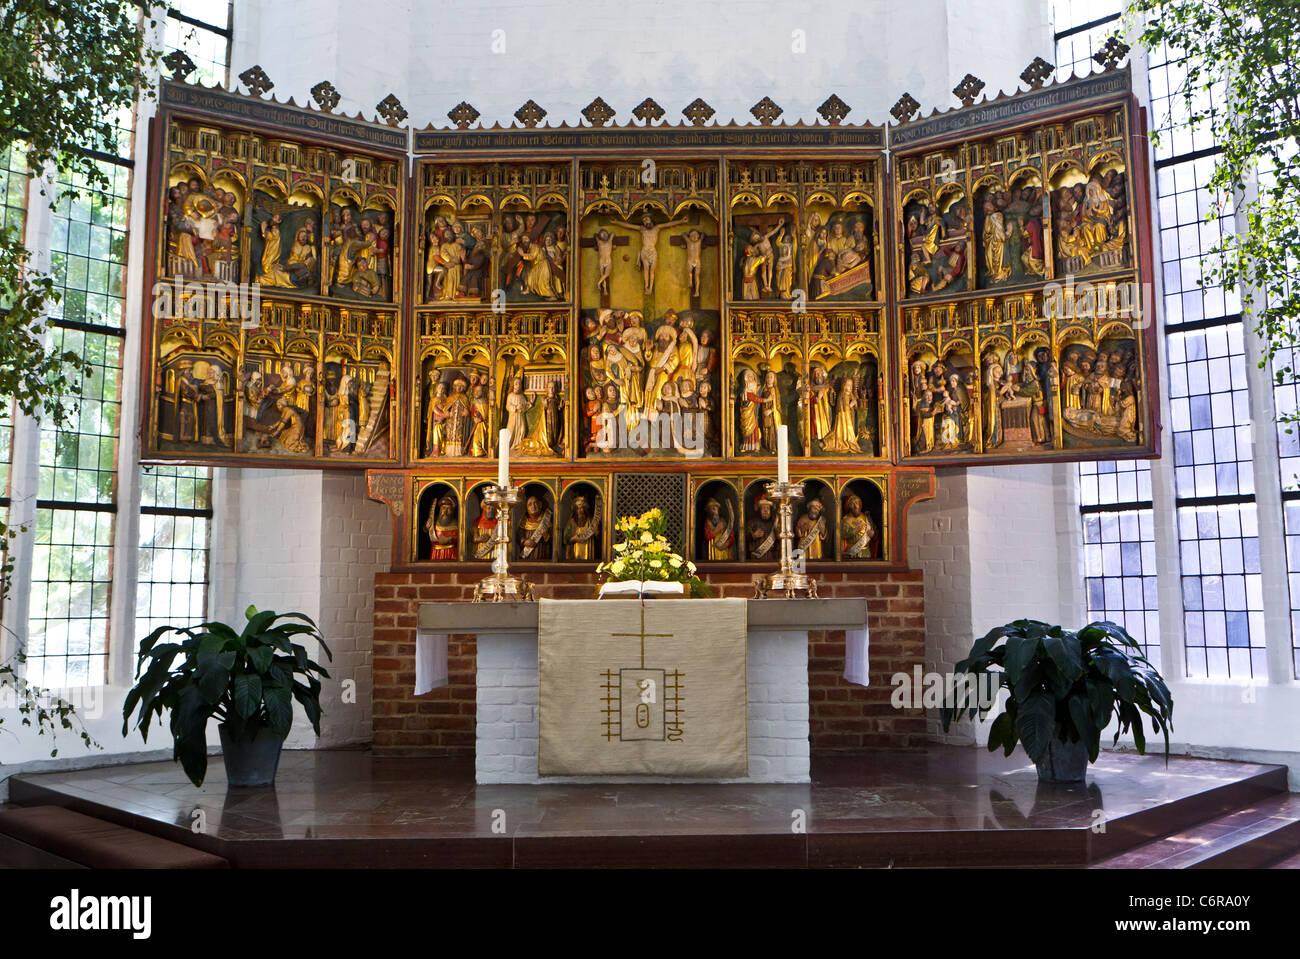 15th-century winged altar-piece at the Nikolaikirche (St. Nicholas' Church) in Kiel, Germany, Lubeck Luneberg - Stock Image